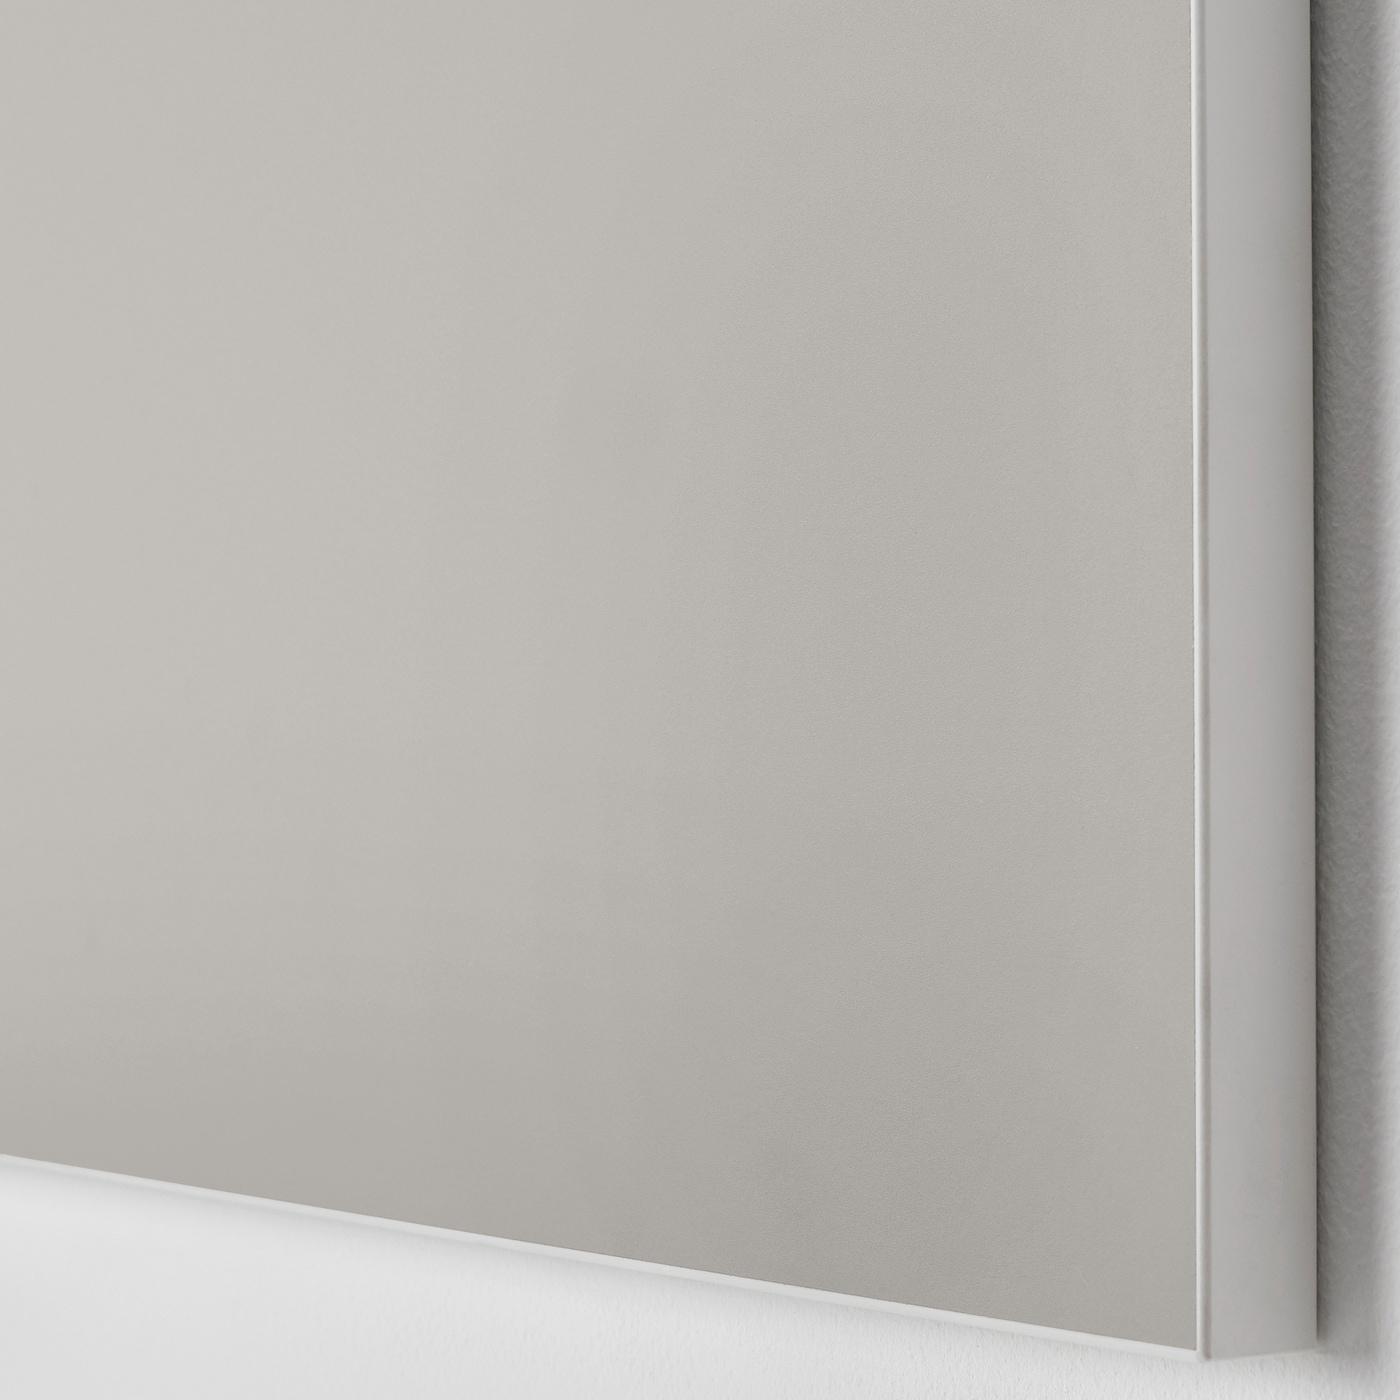 SKATVAL Drawer front, light grey, 60x20 cm